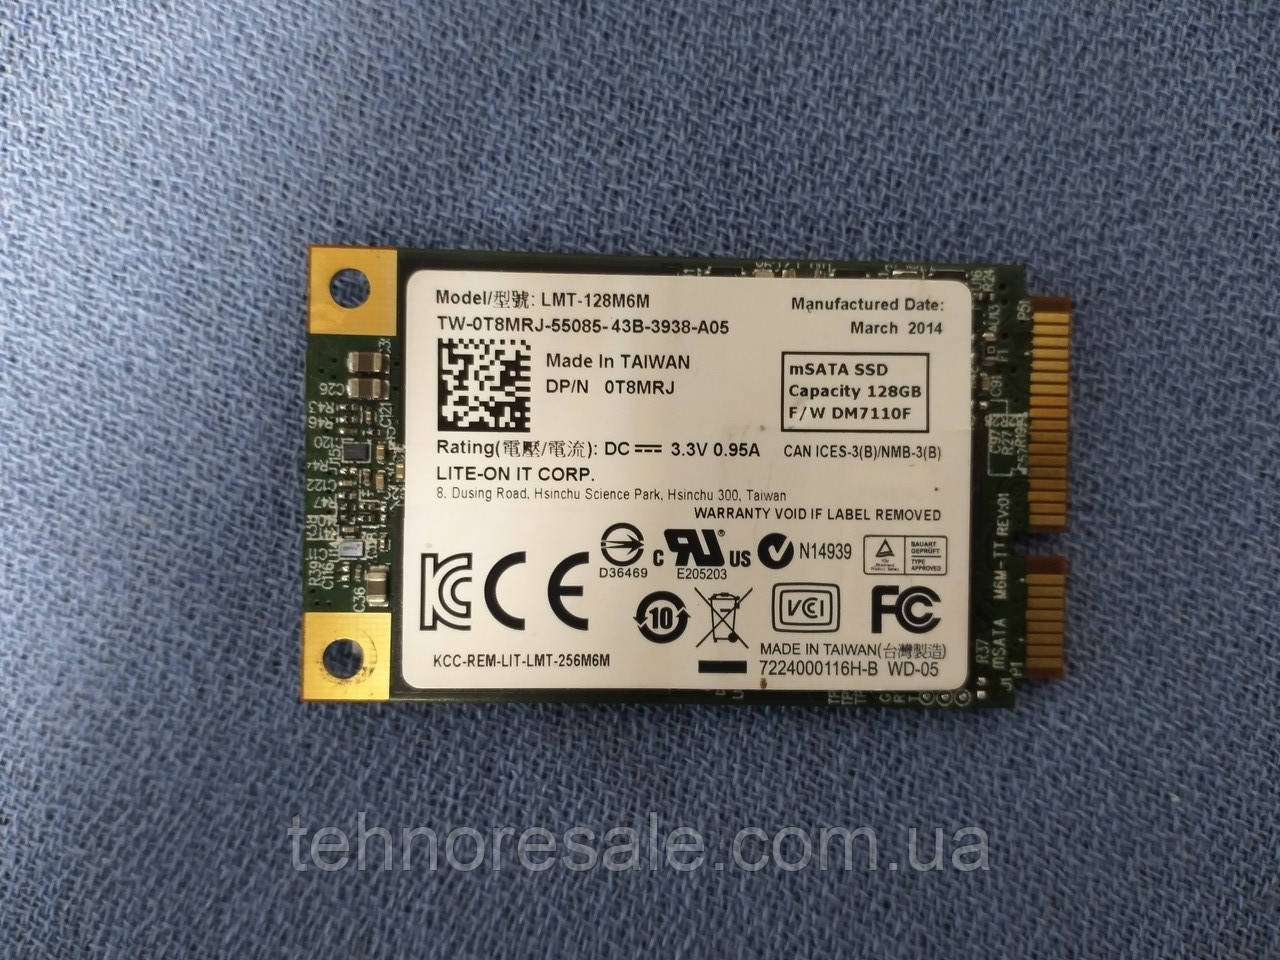 SSD Hoodisk 64Gb mSATA